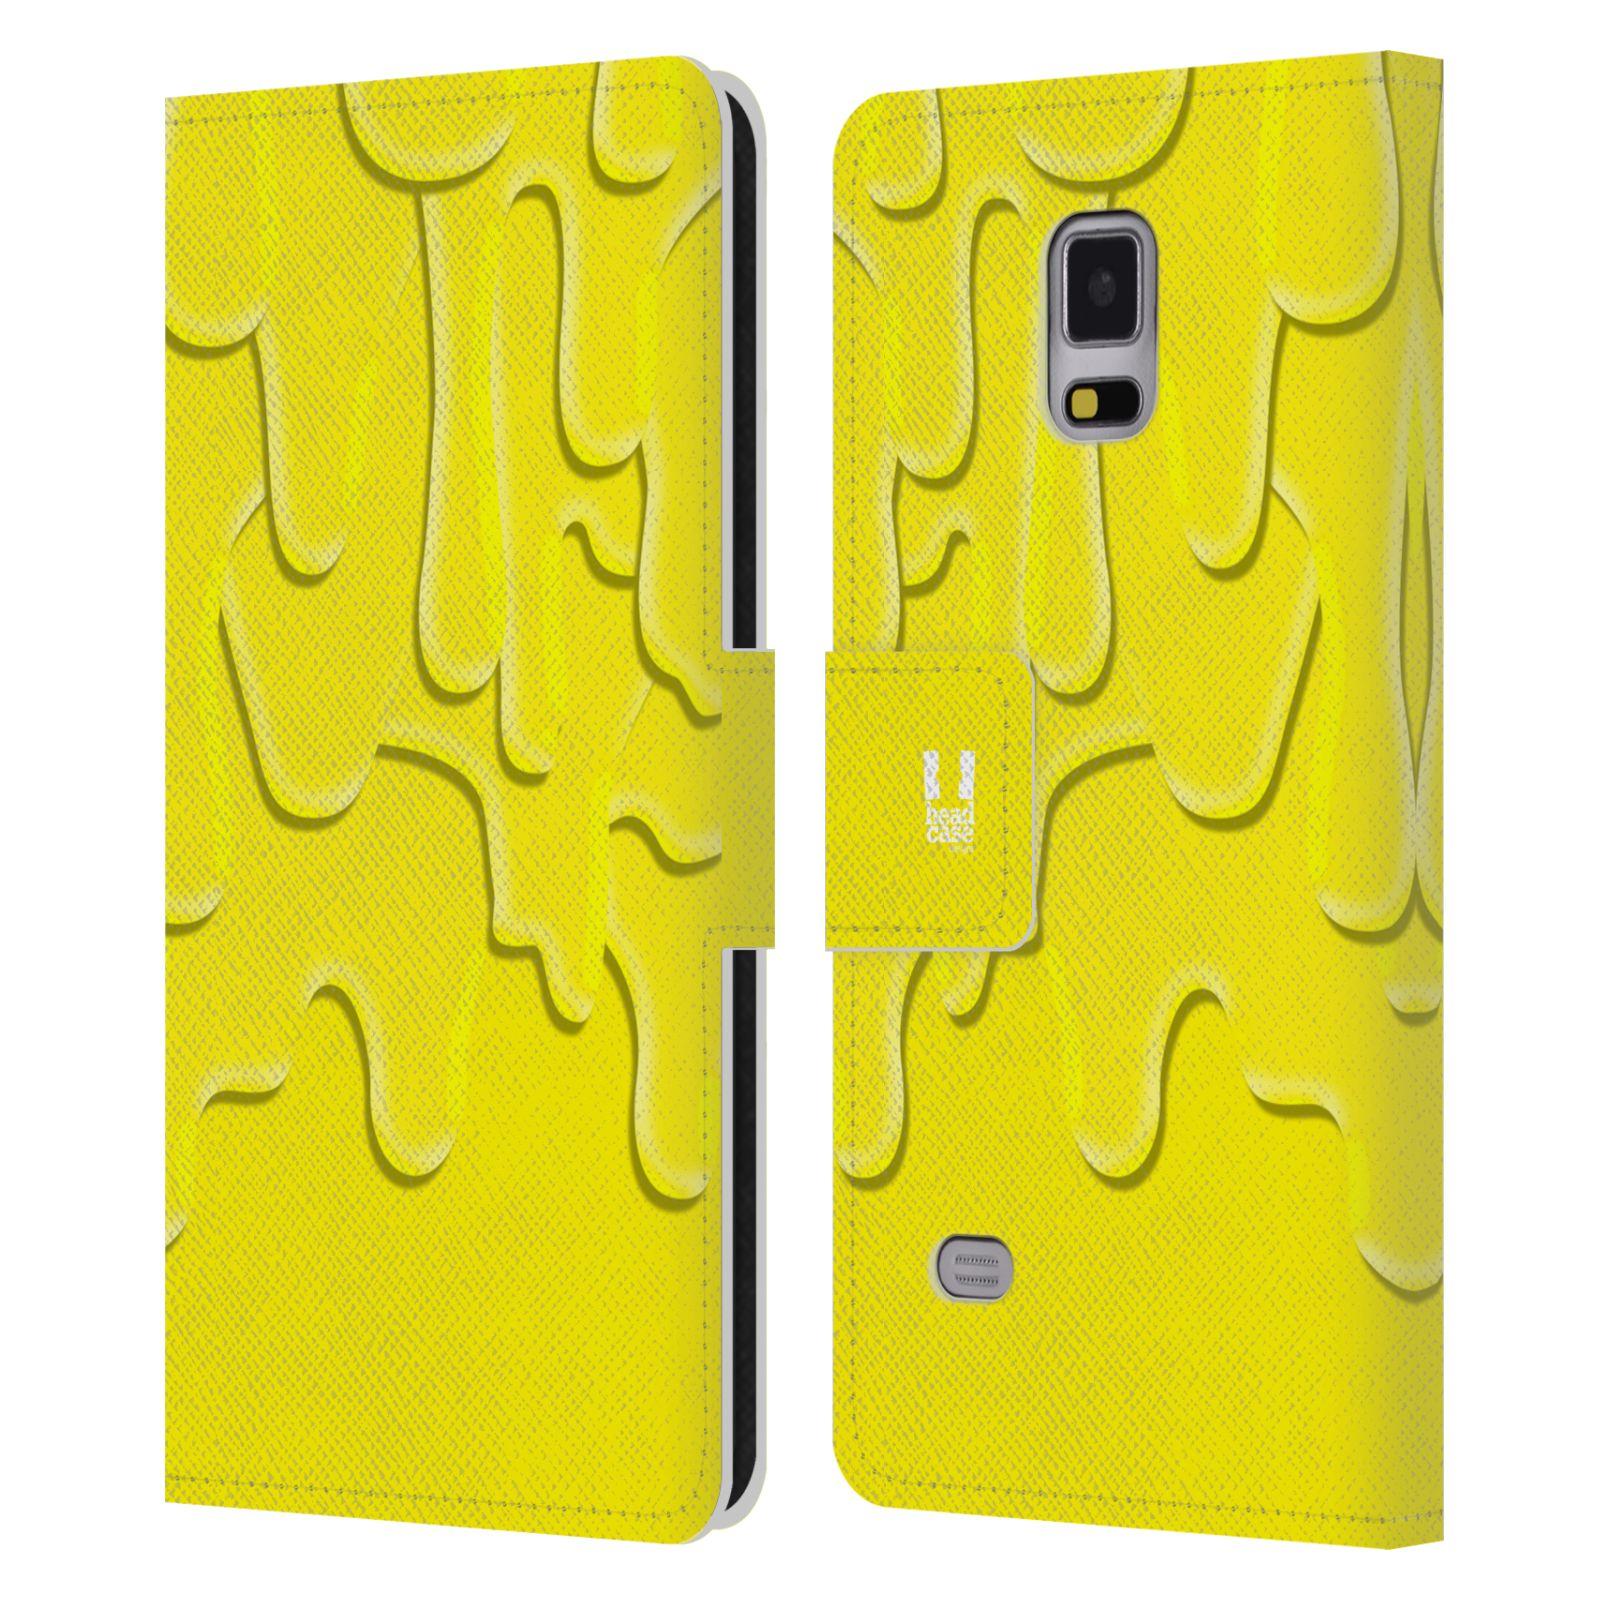 HEAD CASE Flipové pouzdro pro mobil Samsung Galaxy Note 4 ZÁPLAVA BARVA žlutá